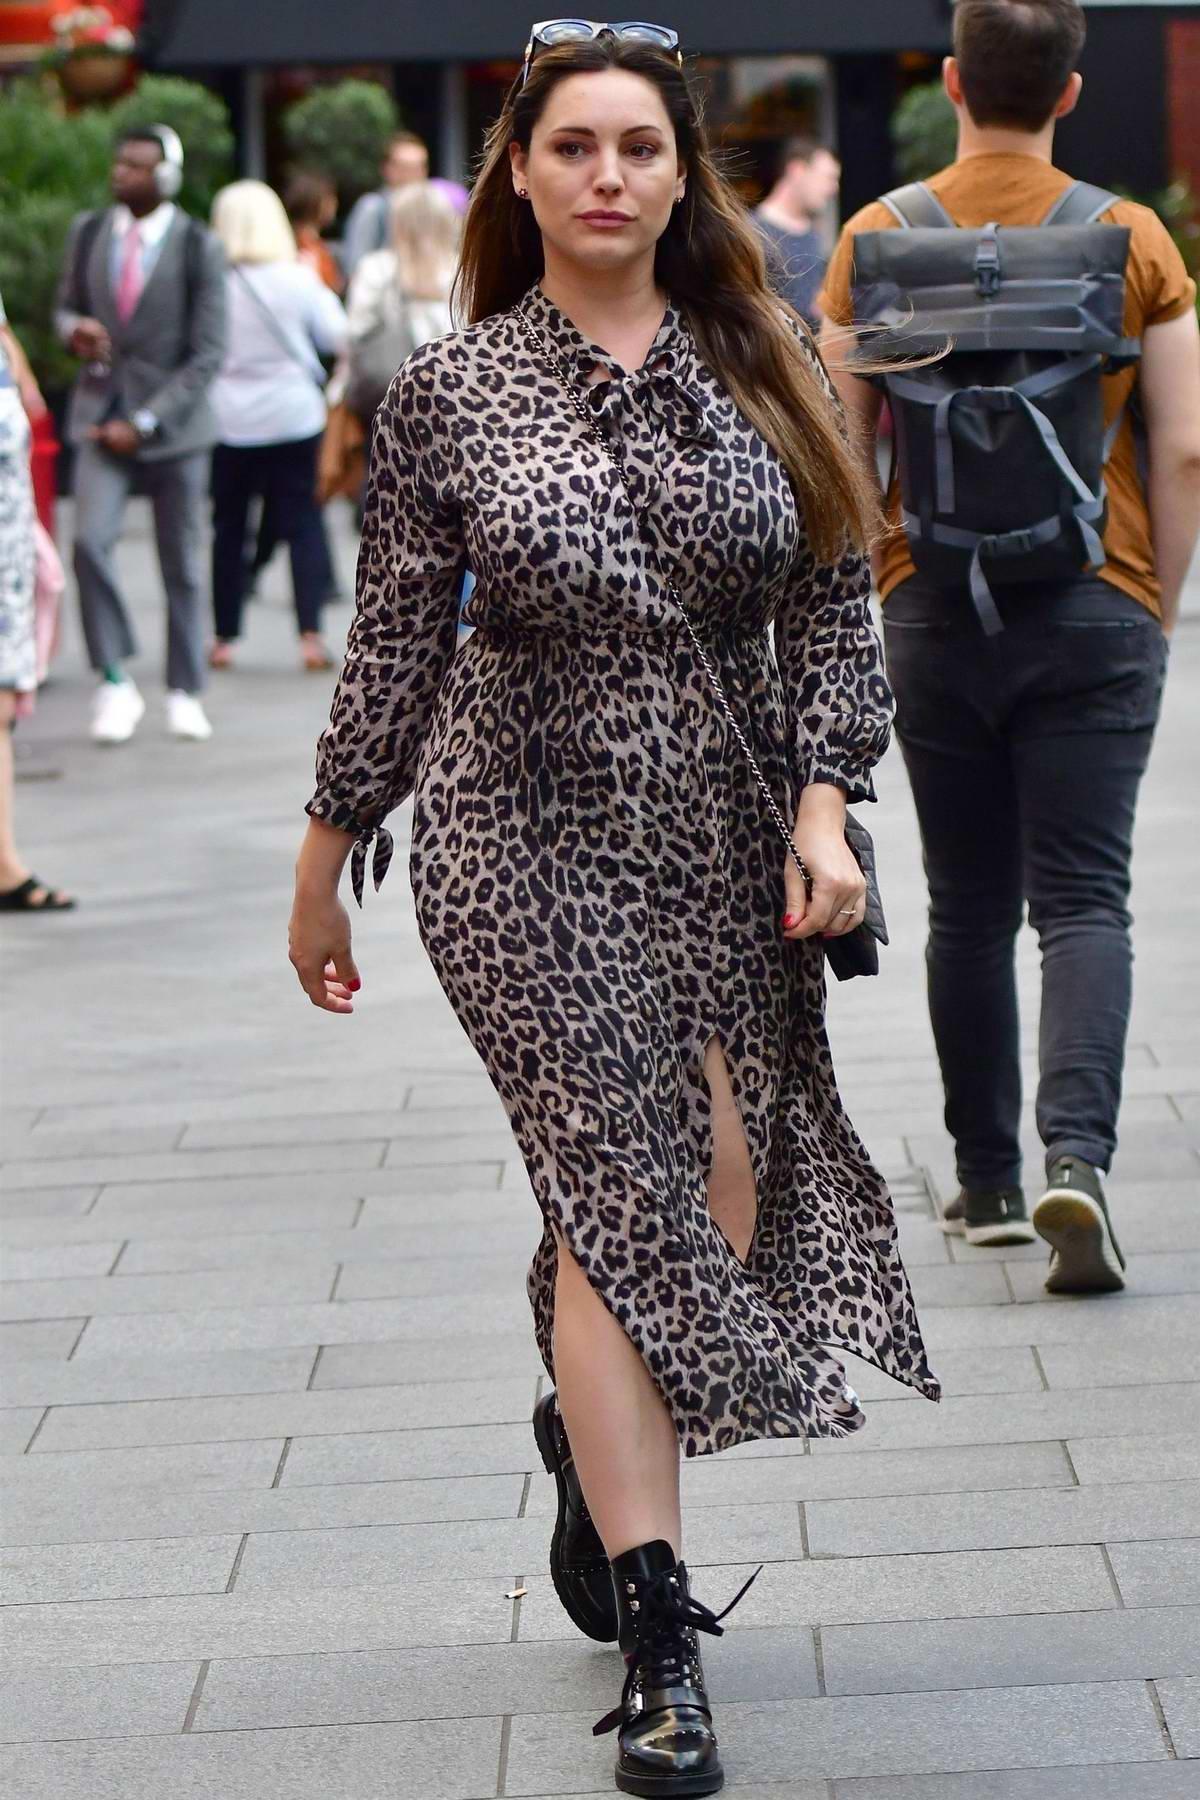 Kelly Brook wears an animal print slit dress as she arrives at Global Radio in London, UK